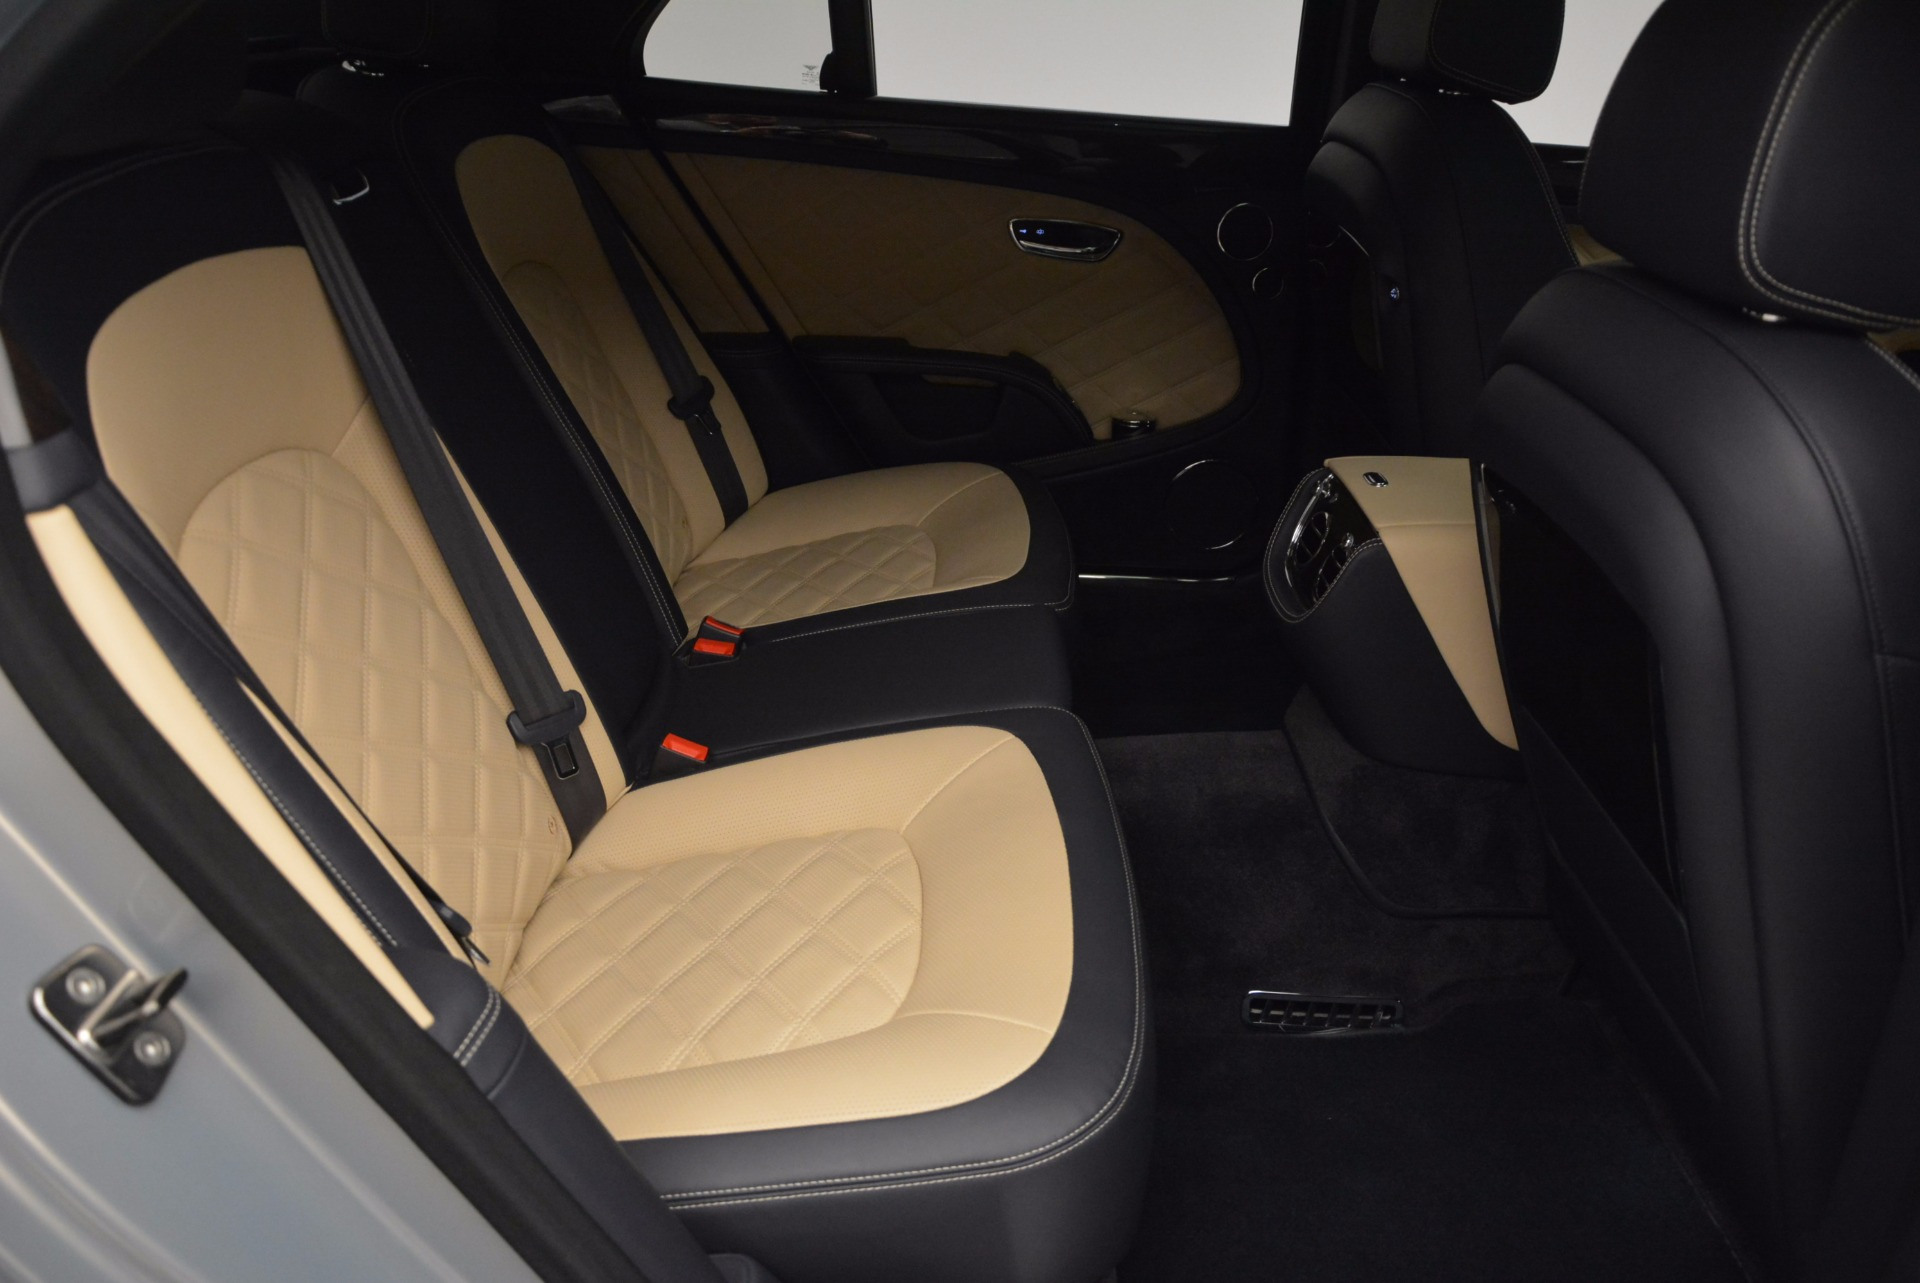 Used 2016 Bentley Mulsanne Speed For Sale In Westport, CT 671_p48